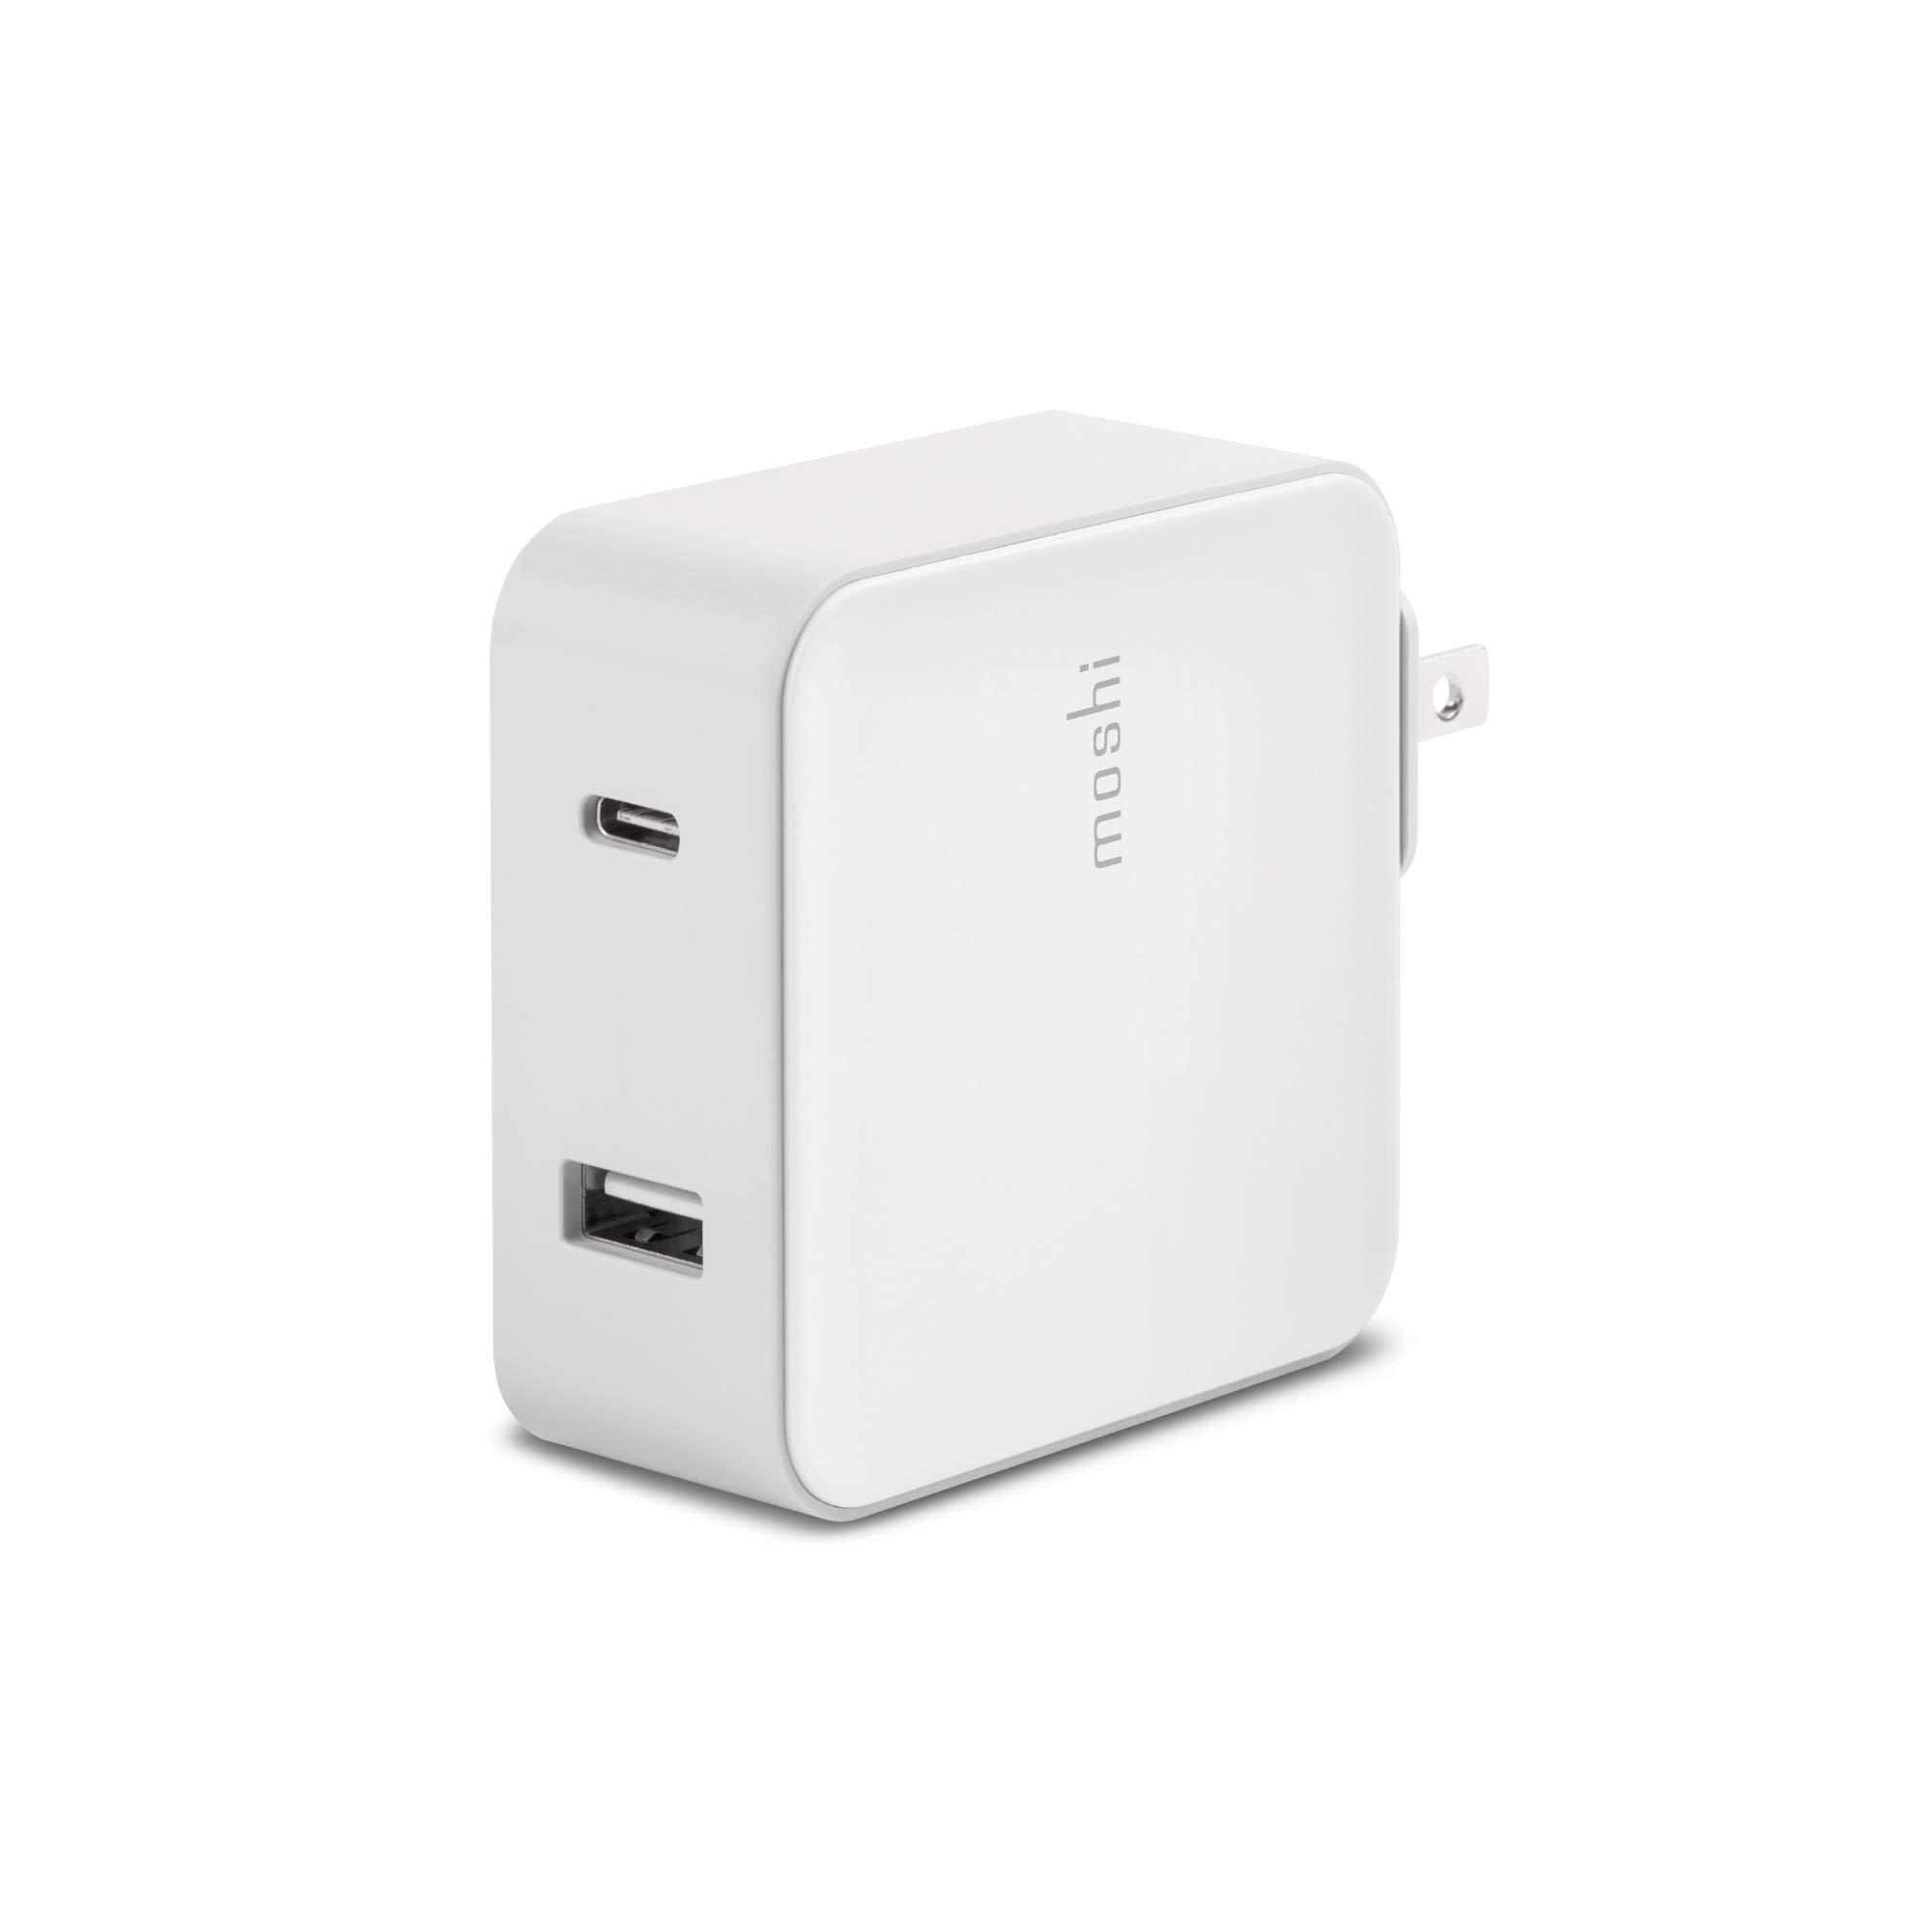 Moshi ProGeo USB-C Wall Charger (42 W, US), USB-C and USB, PD3.0 and QC3.0